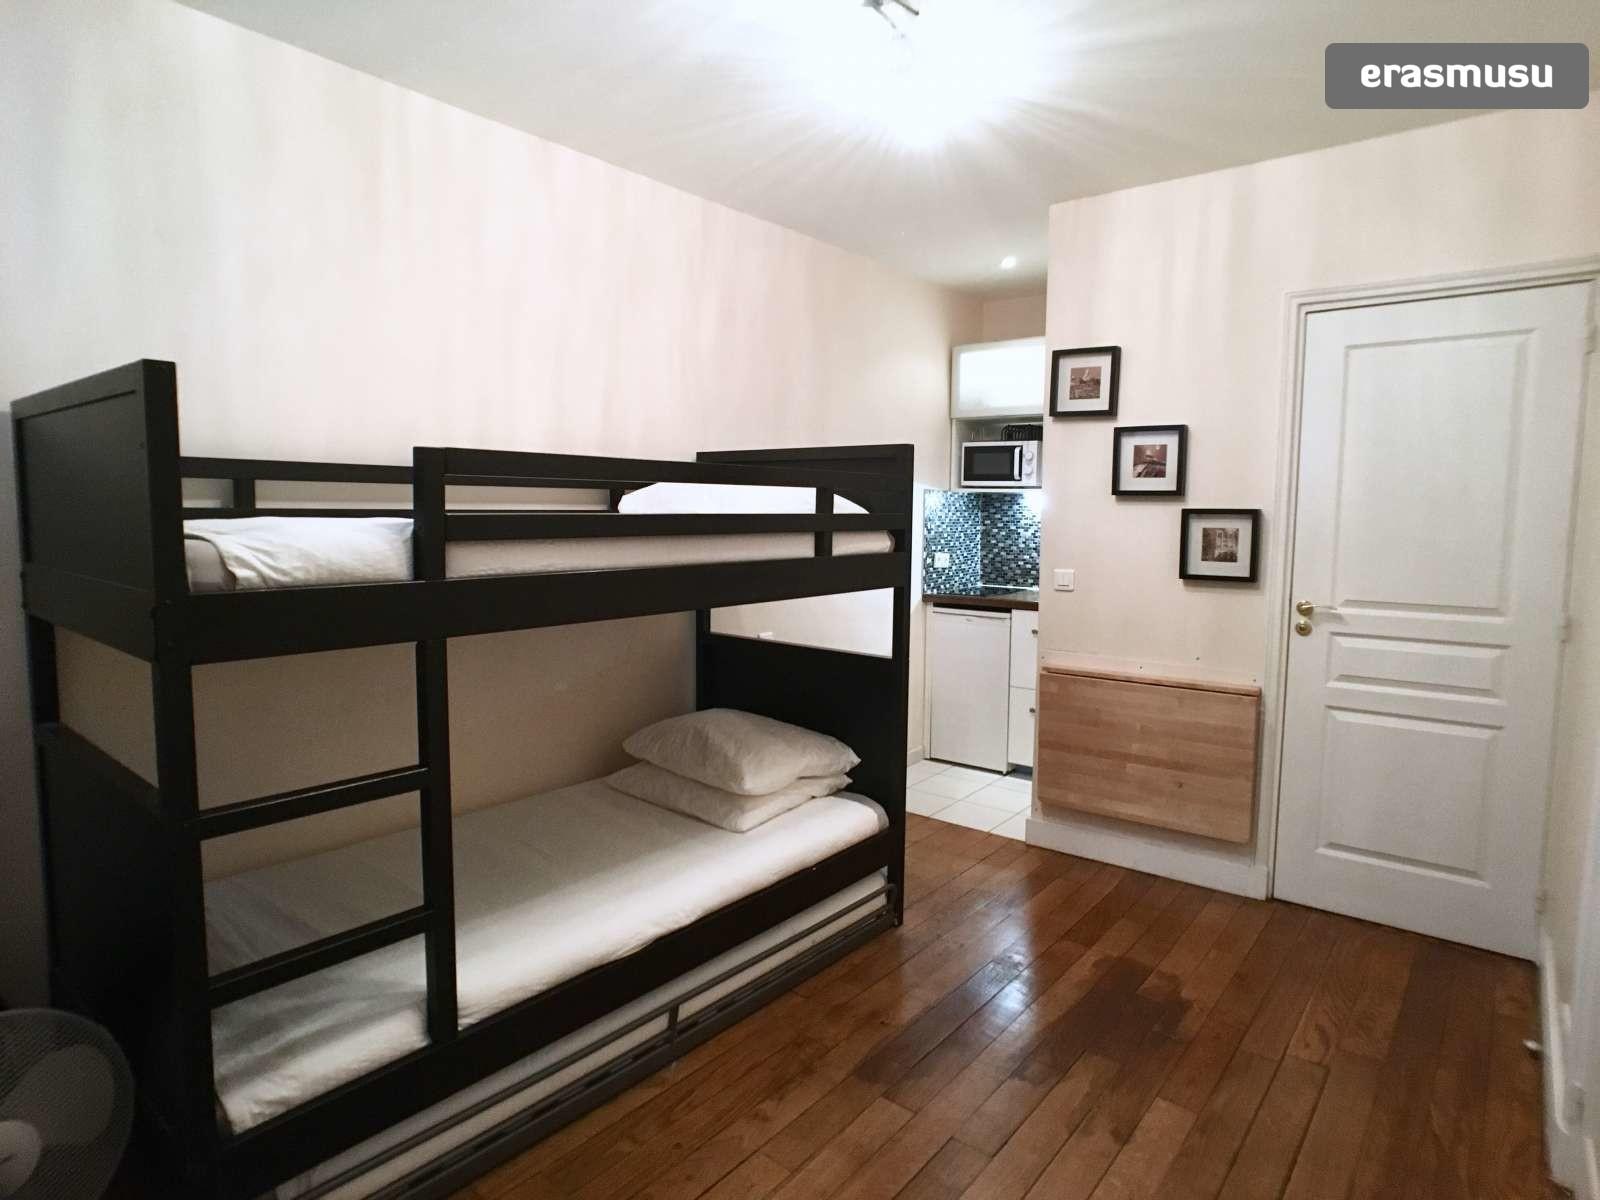 Cozy Studio With Bunk Beds For Rent In Lourve Rent Studios Paris